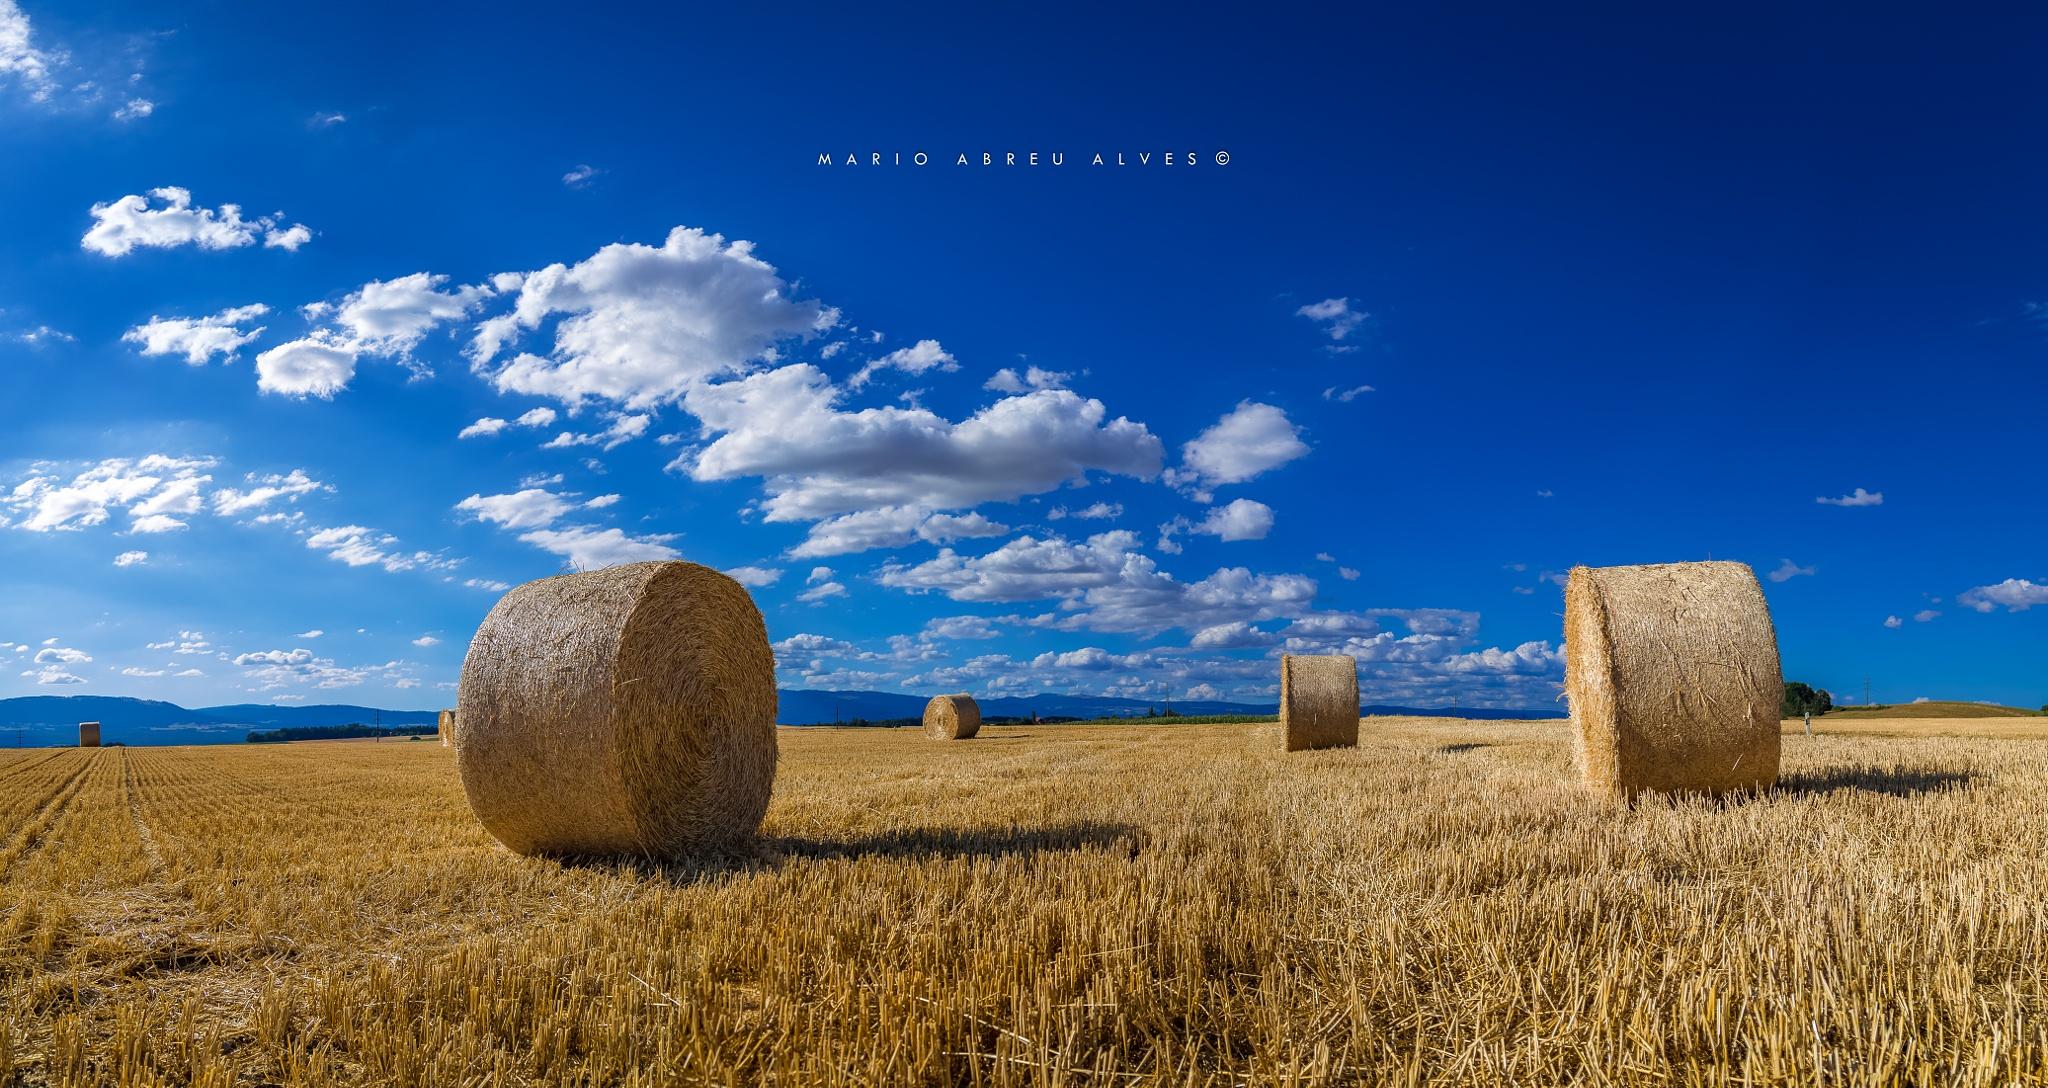 rolls of straw by abreualvesmario